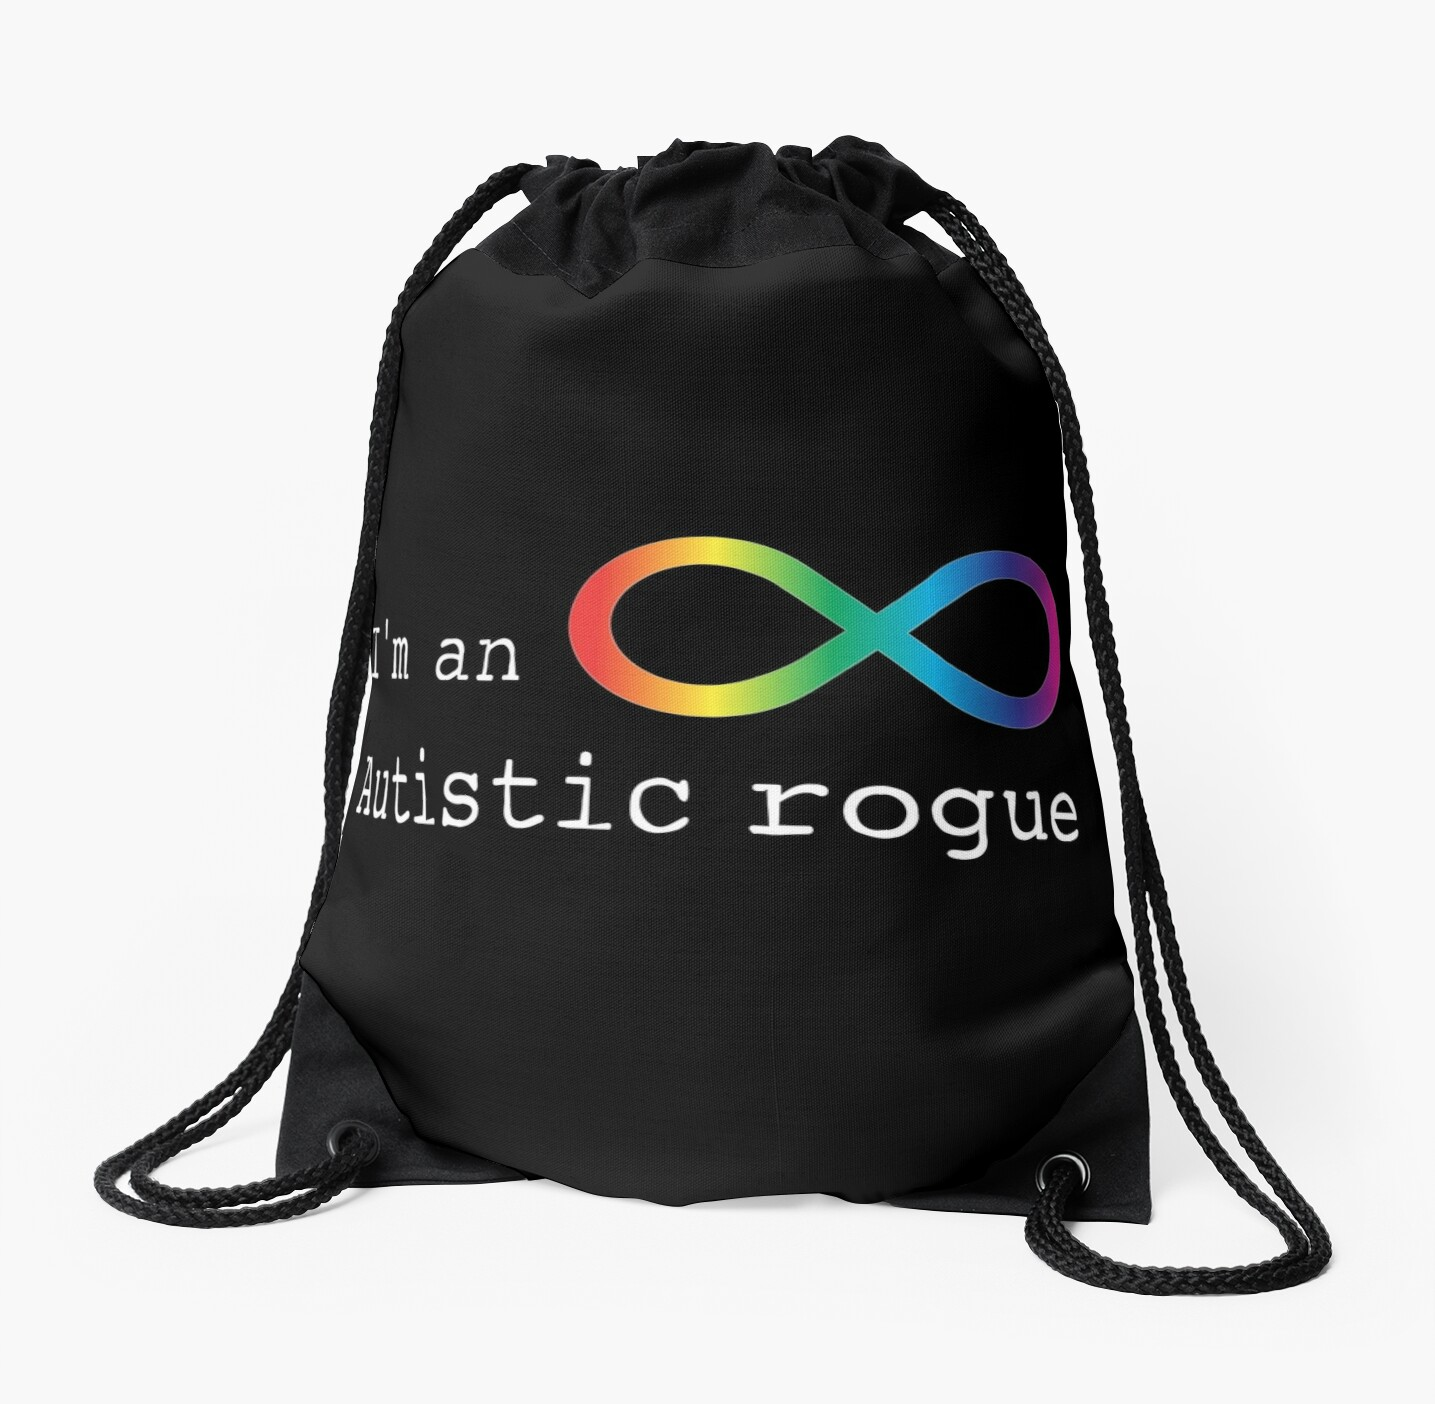 Autistic Rogue by shaneisadragon